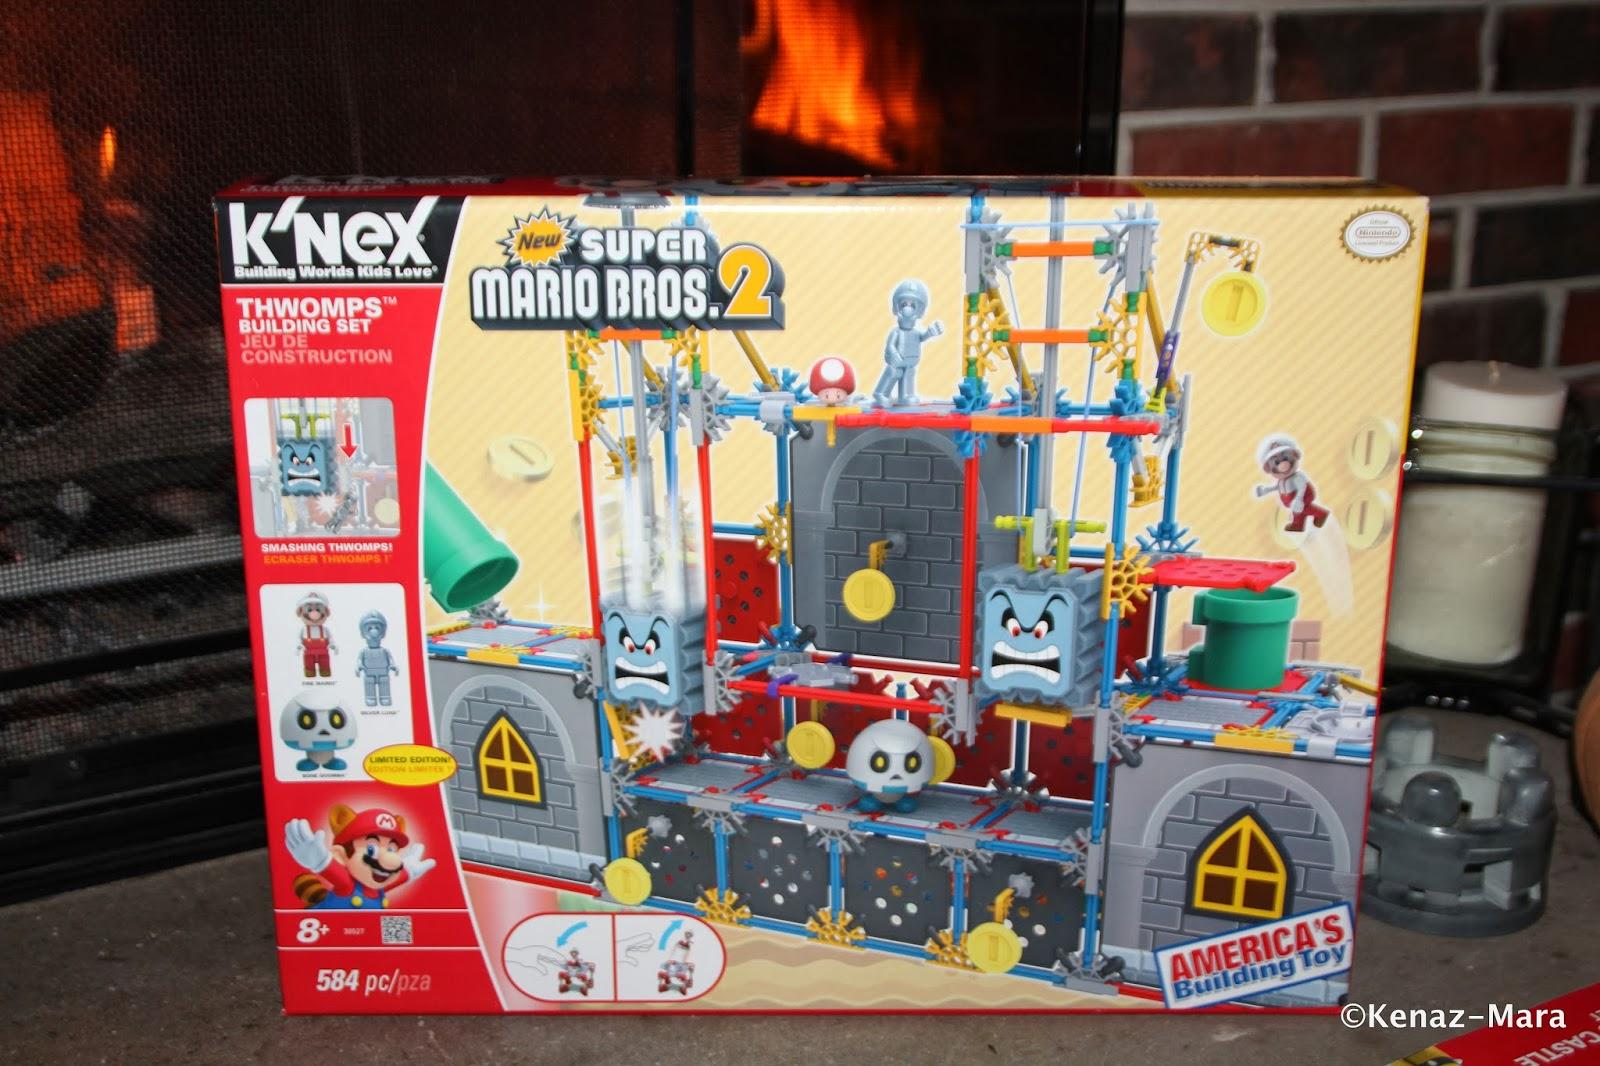 ChiIL Mama : Holidaze Day #4: New Super Mario Bros ™ 2 Thwomps